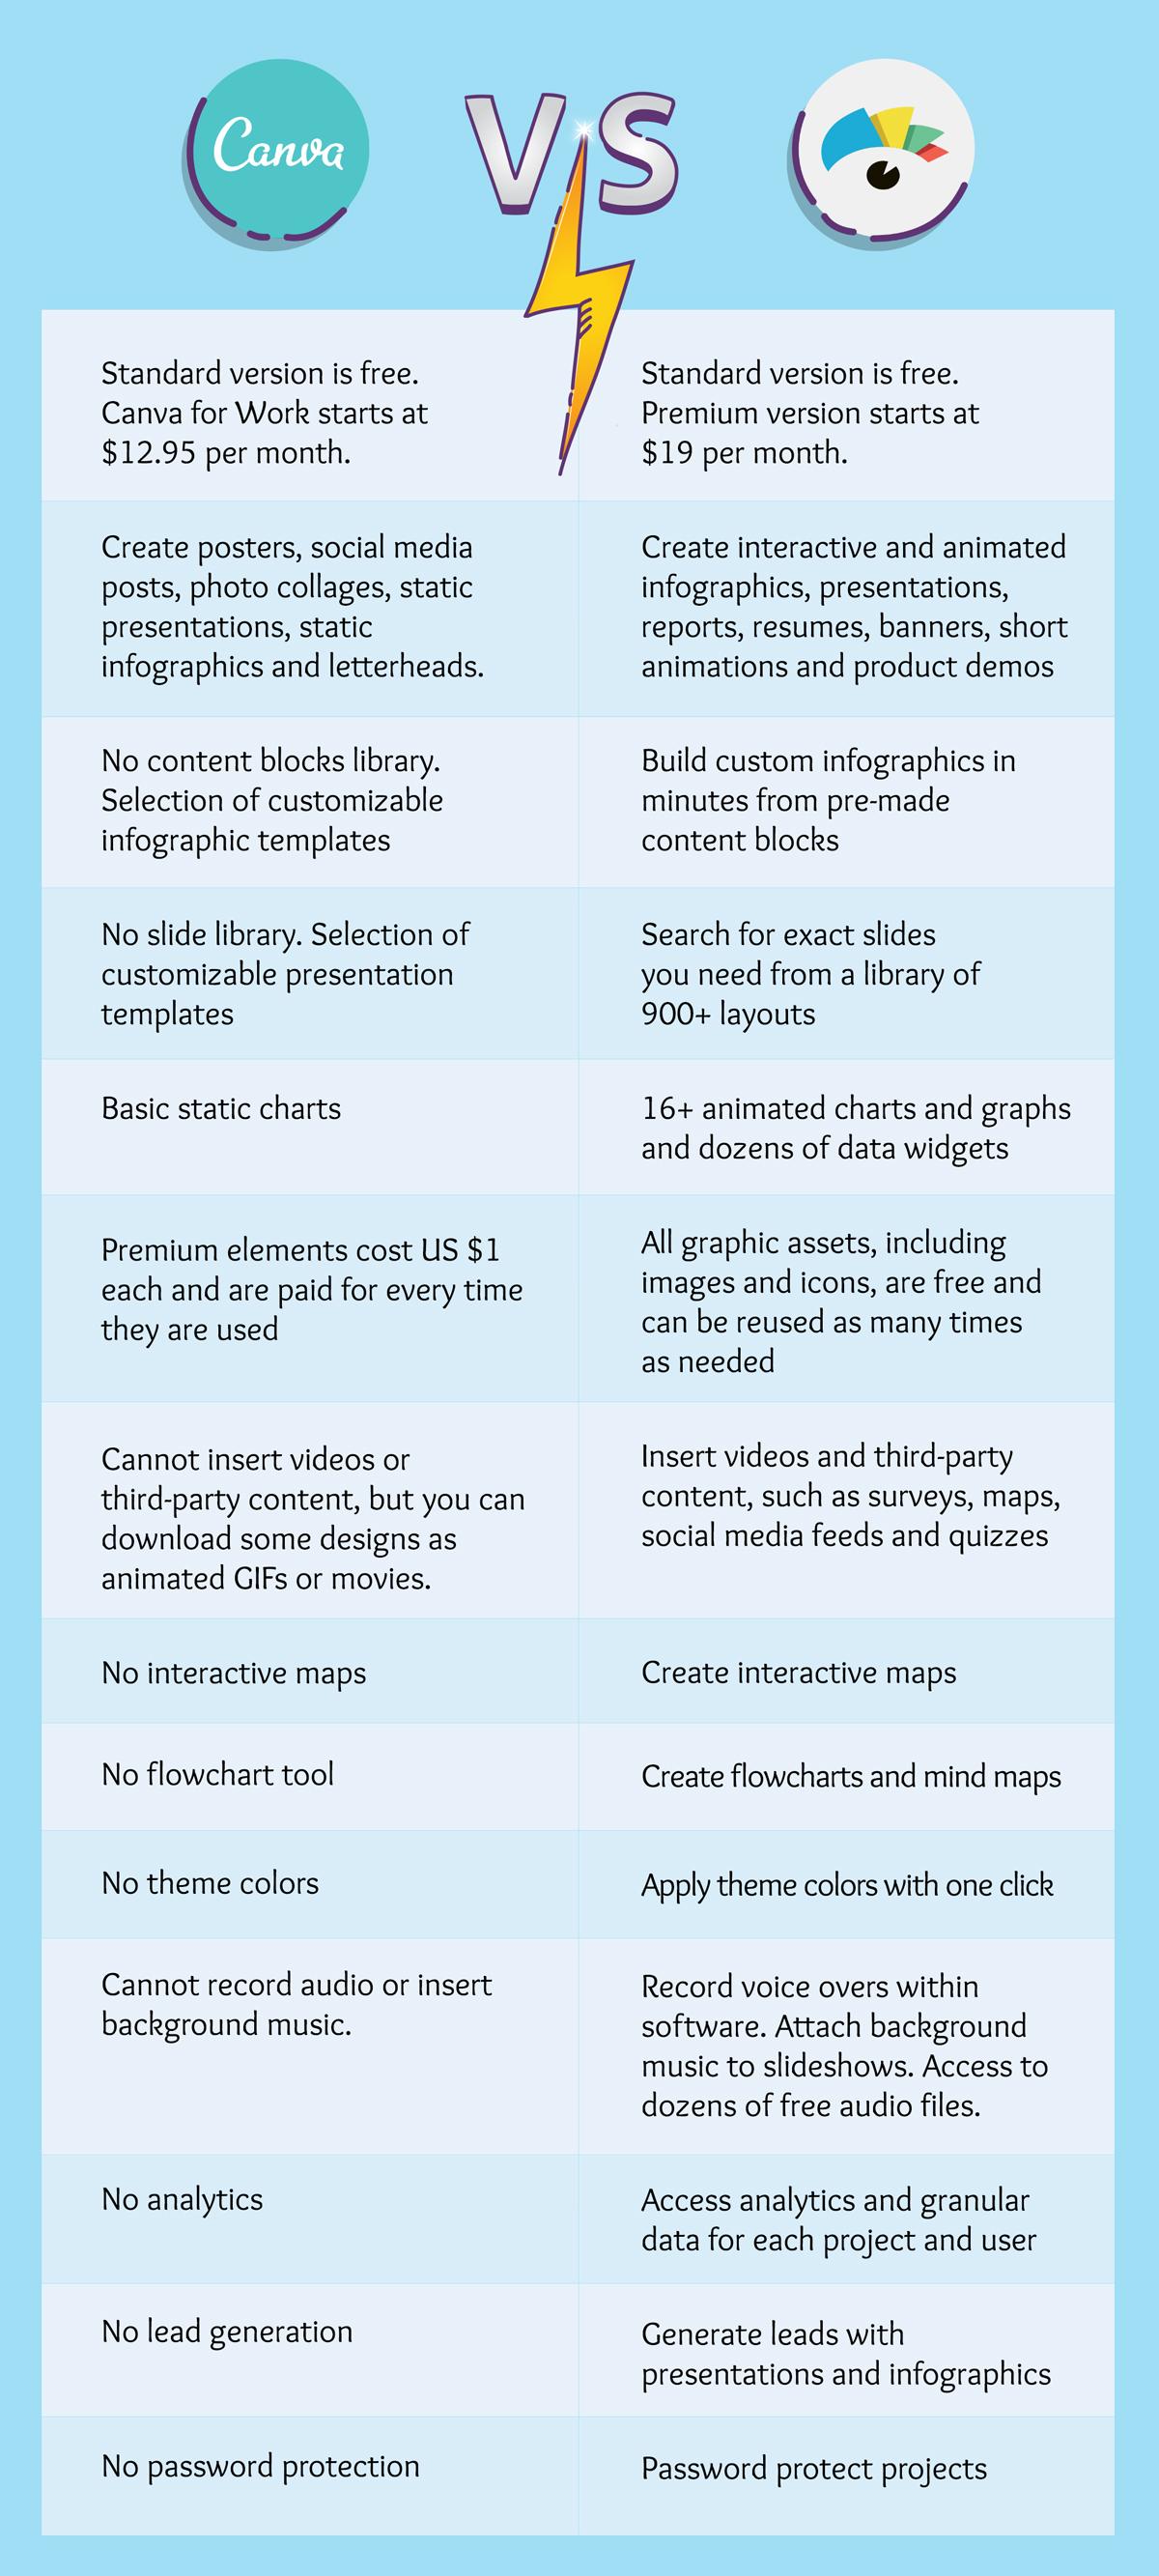 canva alternatives comparison with visme infographic